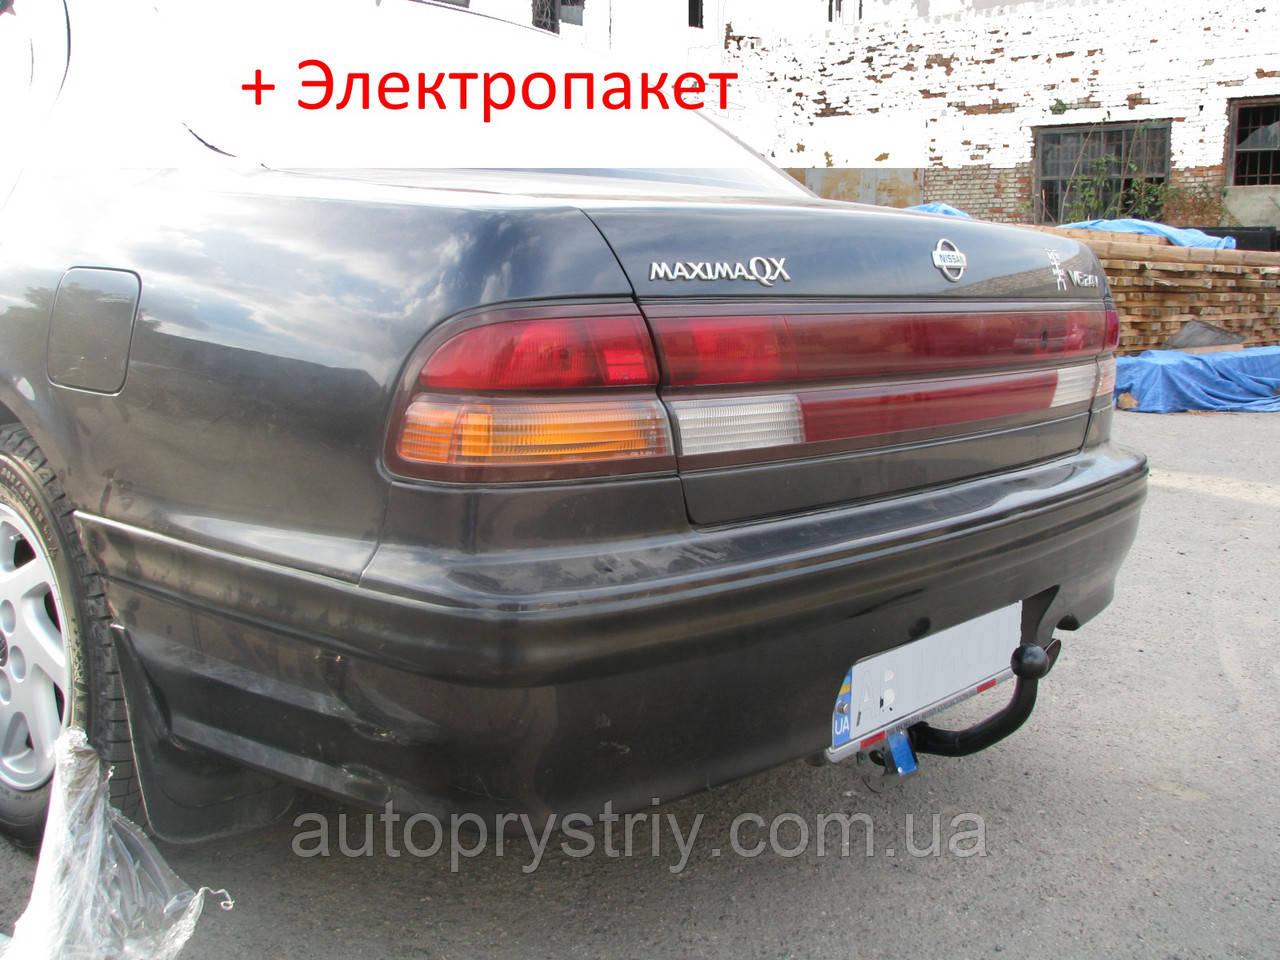 Фаркоп - Nissan Maxima Седан (1994-1997)